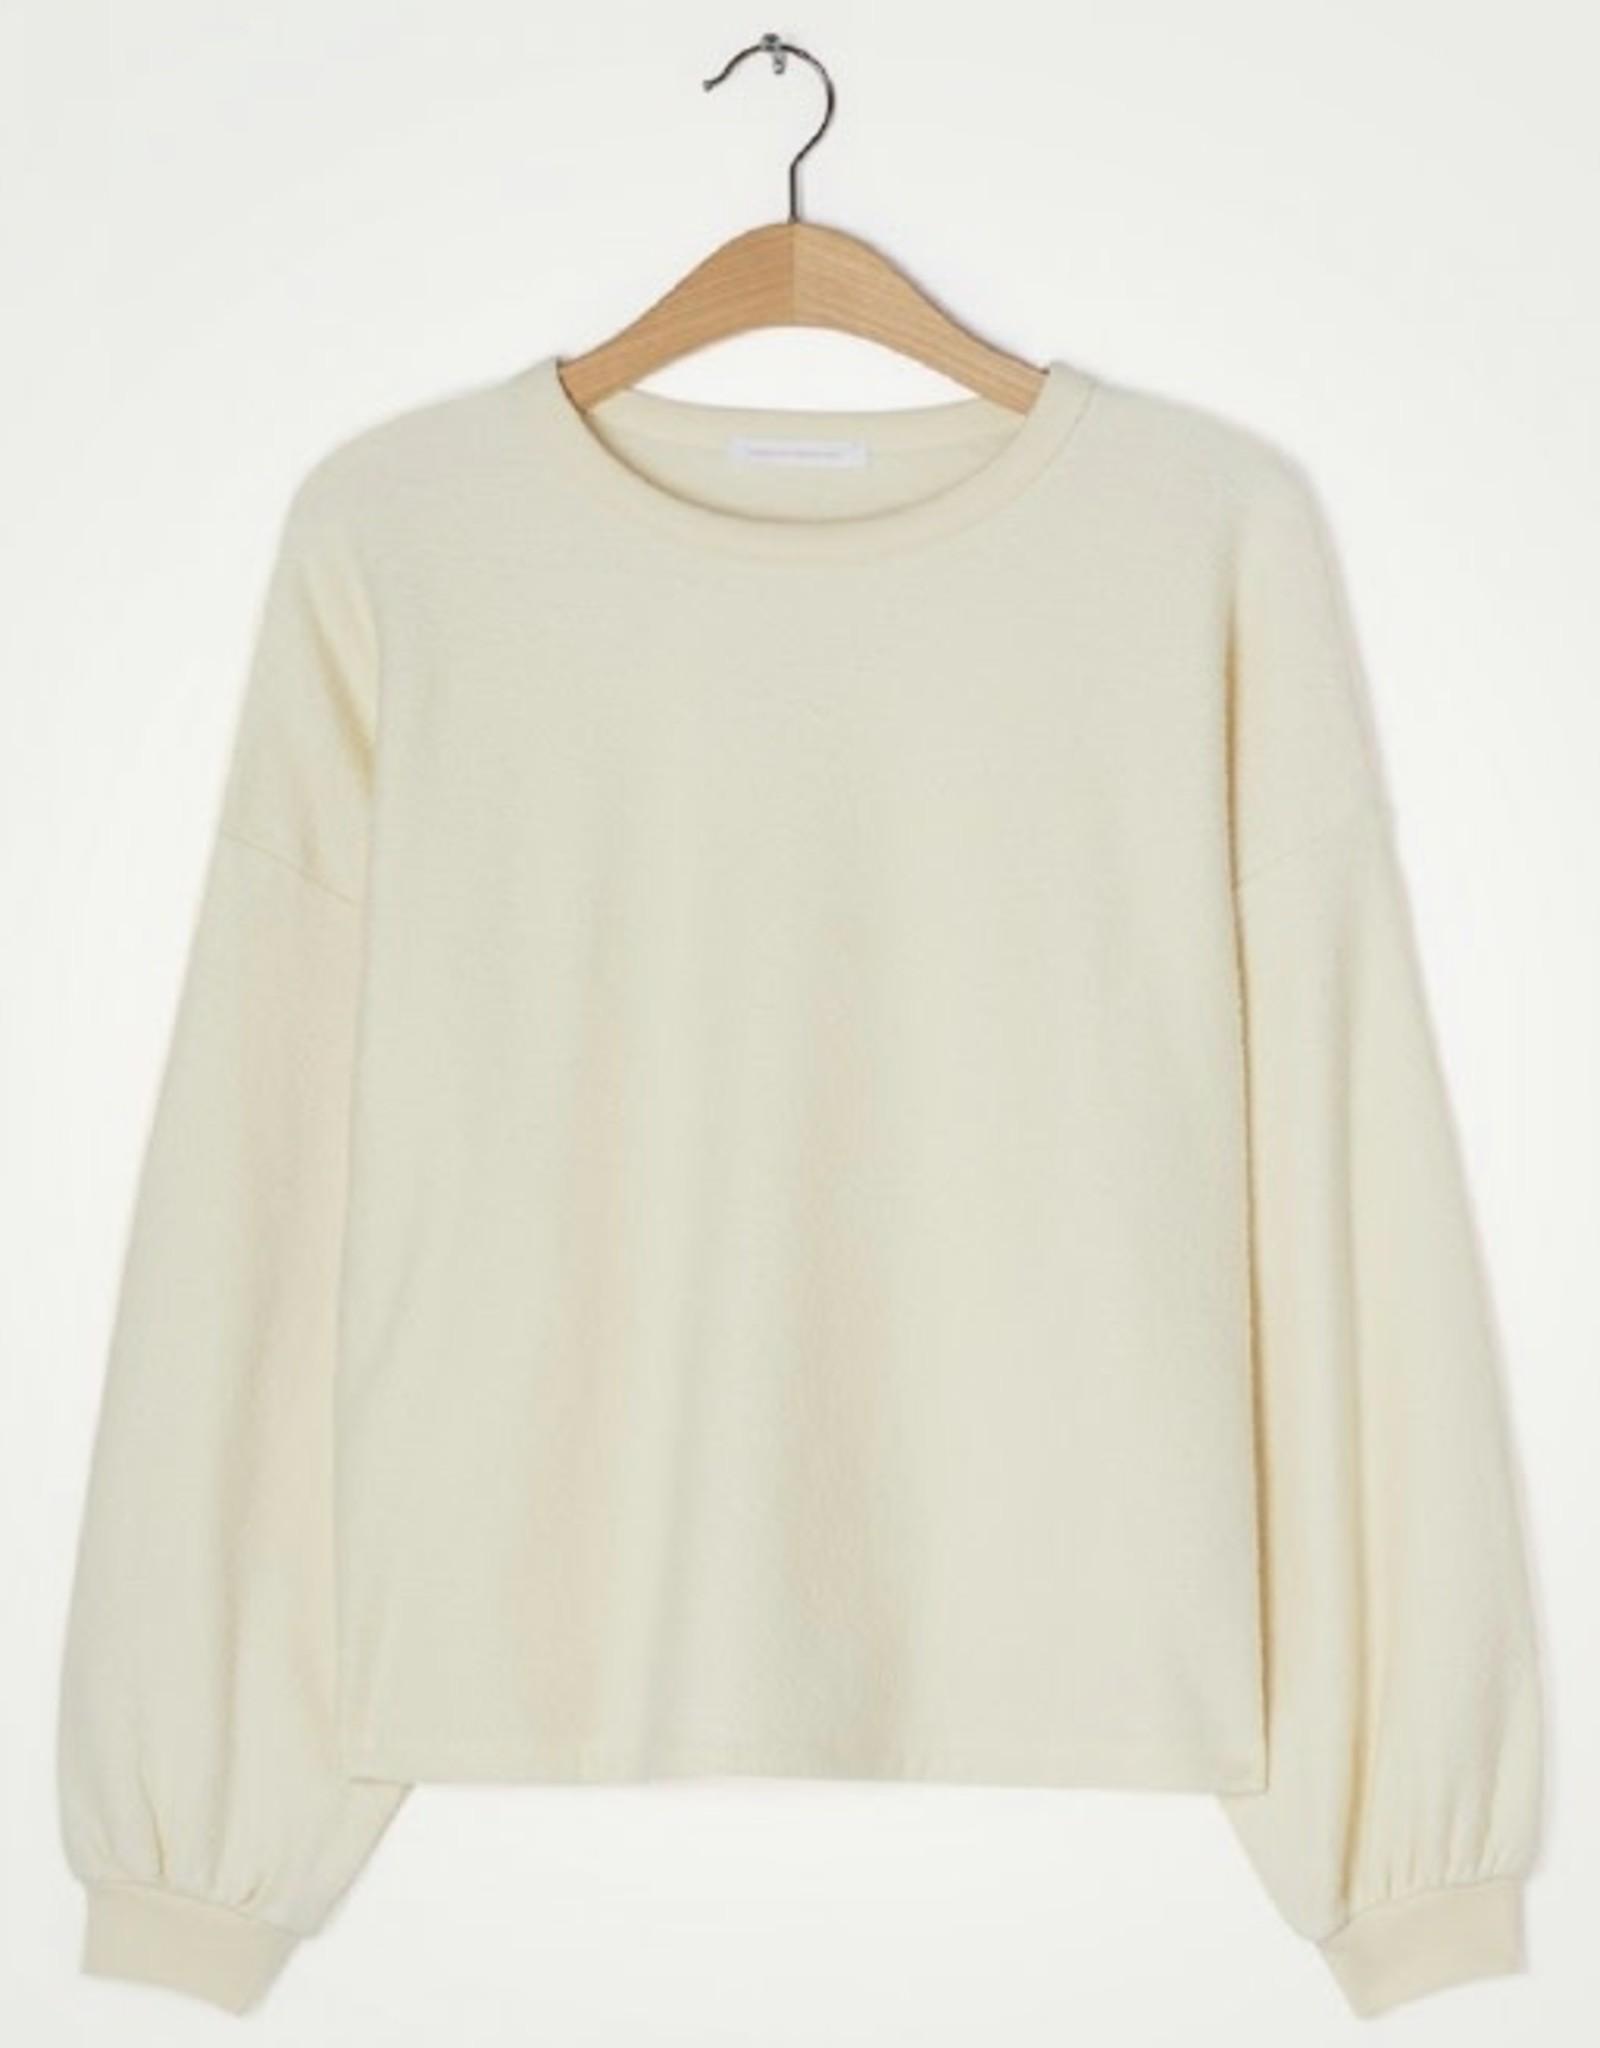 American Vintage Pull/Sweater 'Bobypark' - Ecru